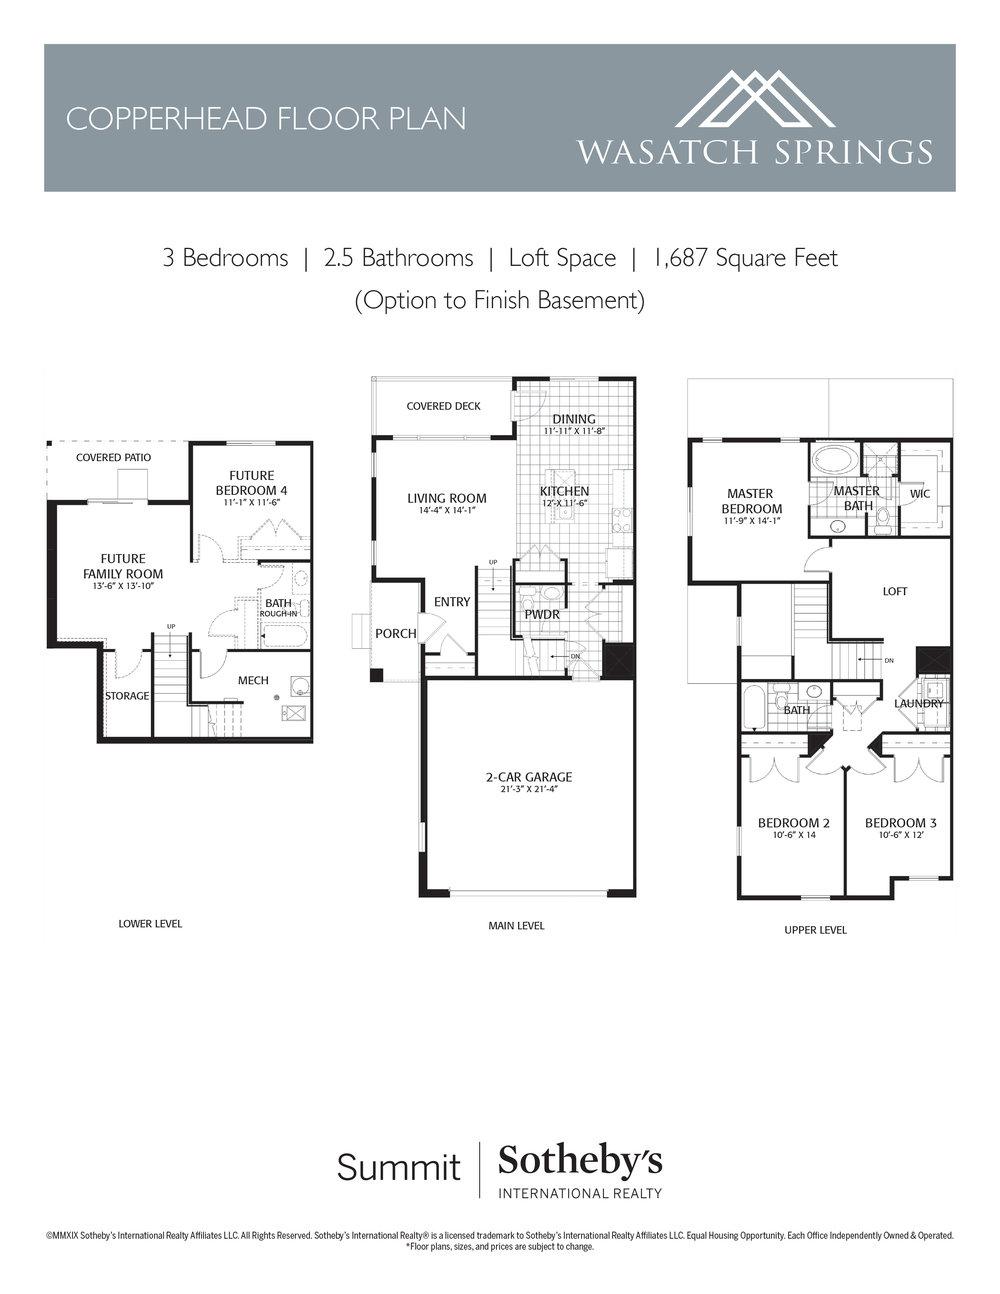 Copperhead Floor Plan.jpg